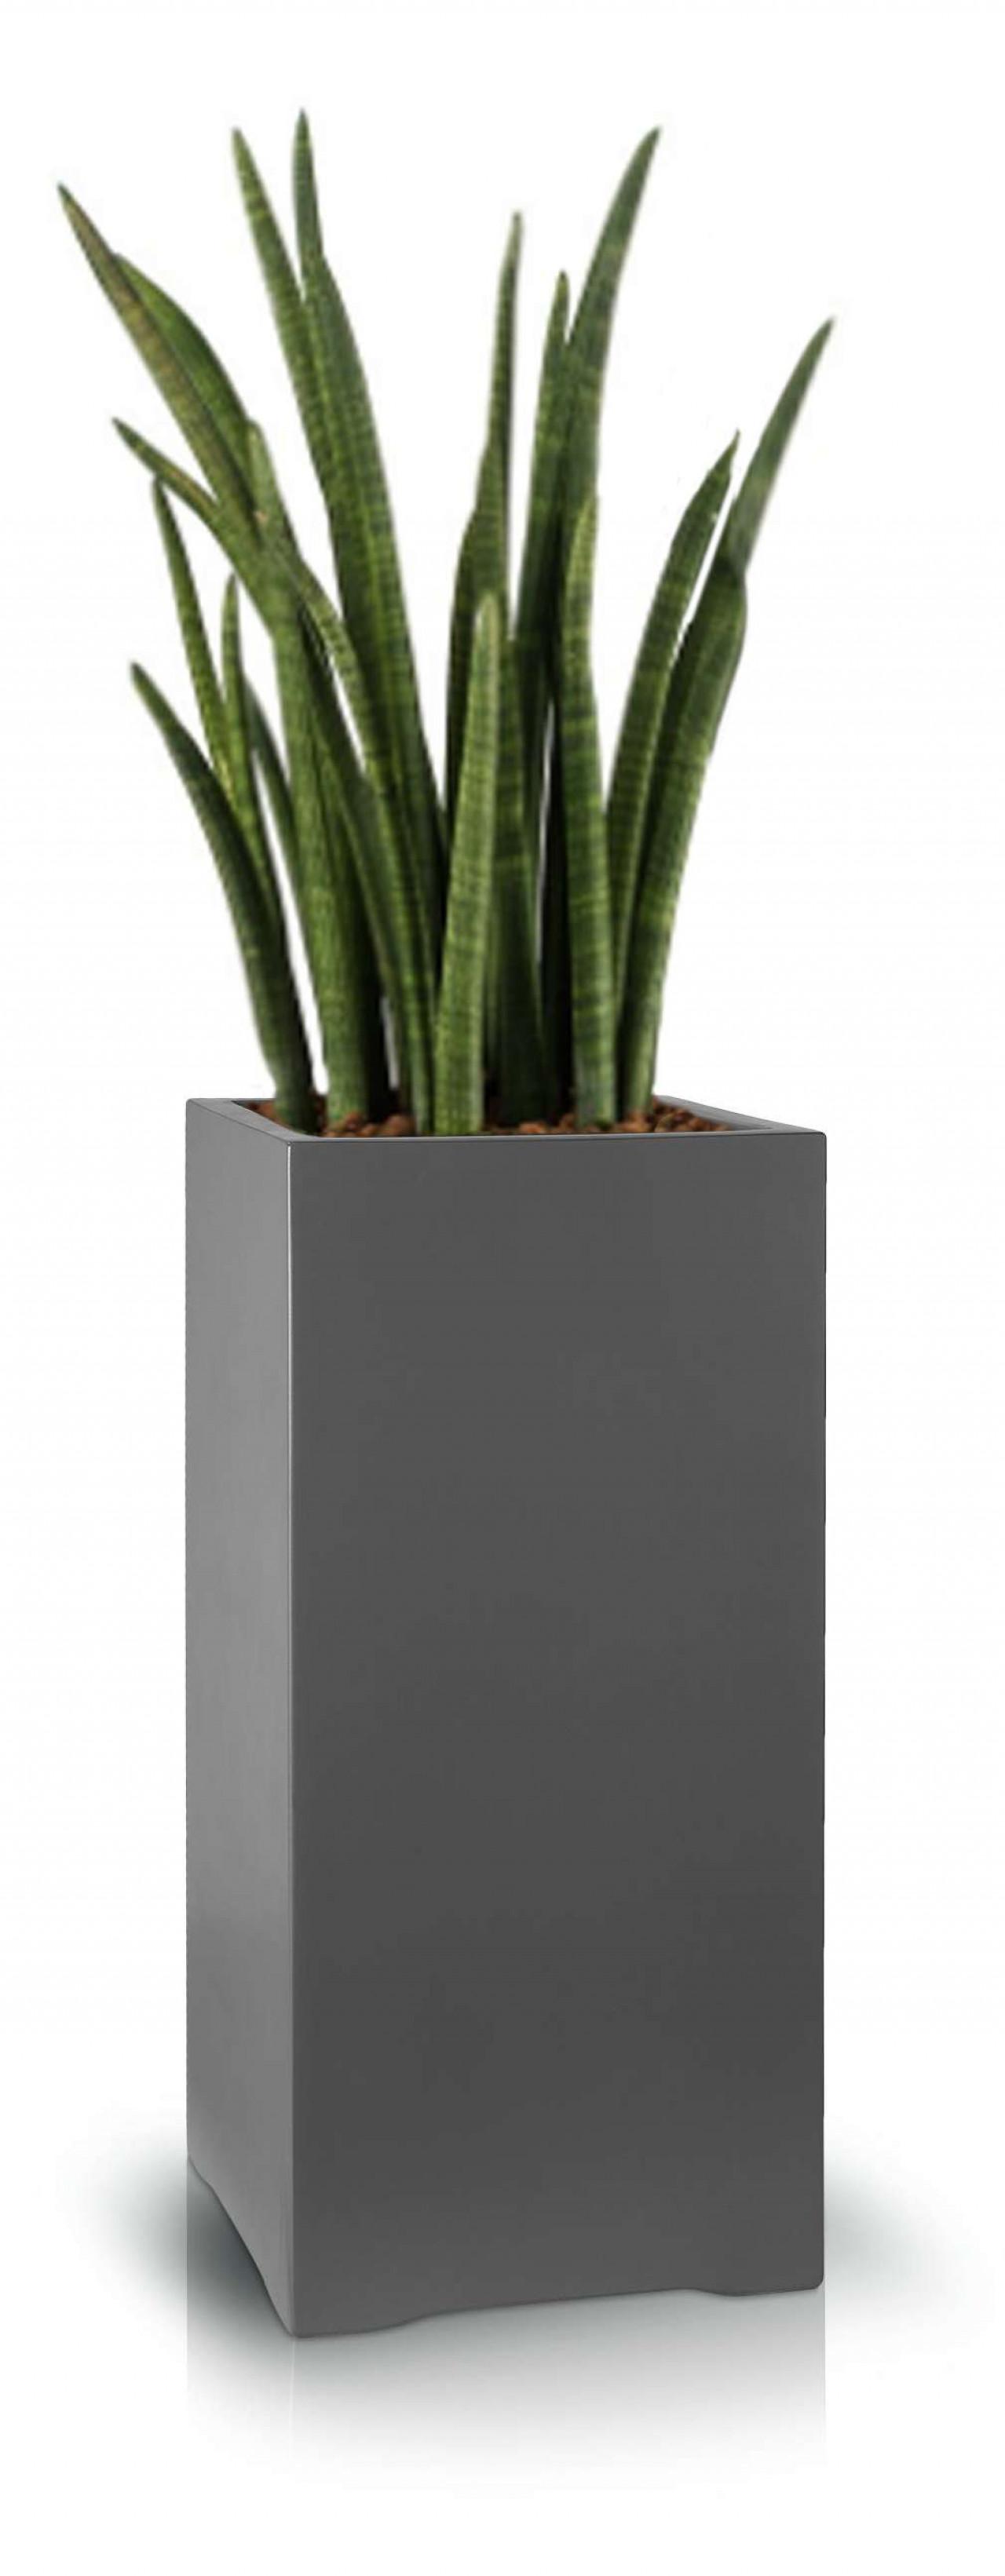 Donica Fiberglass 700 x 340 mm 95.018.70